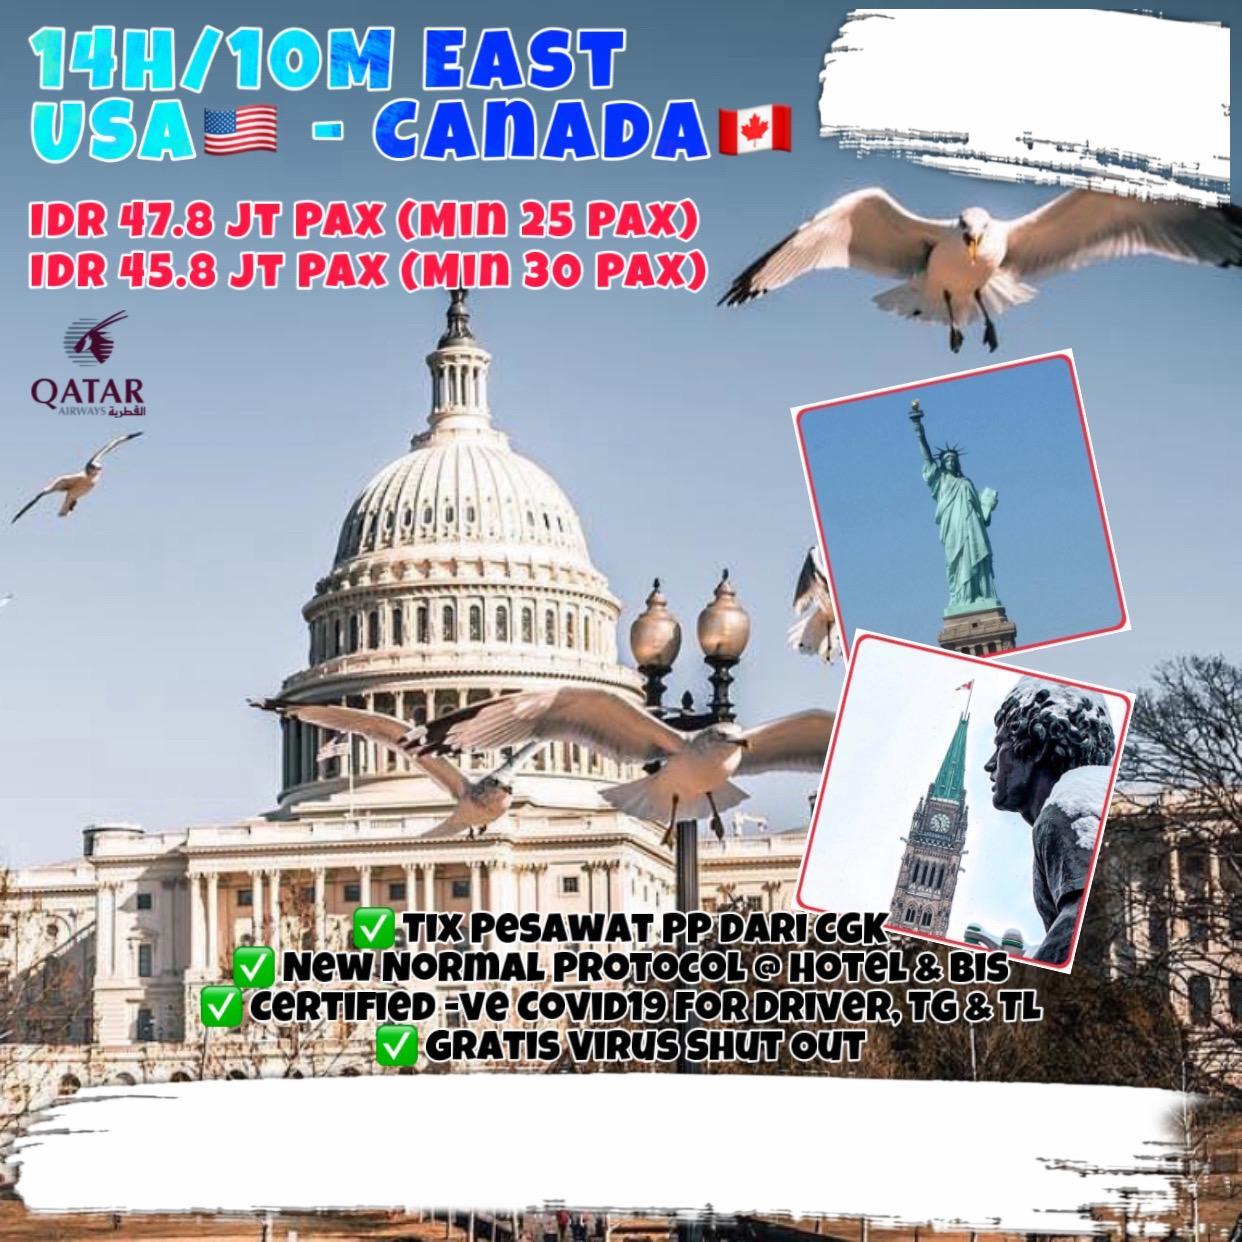 14H/10M EAST USA - CANADA